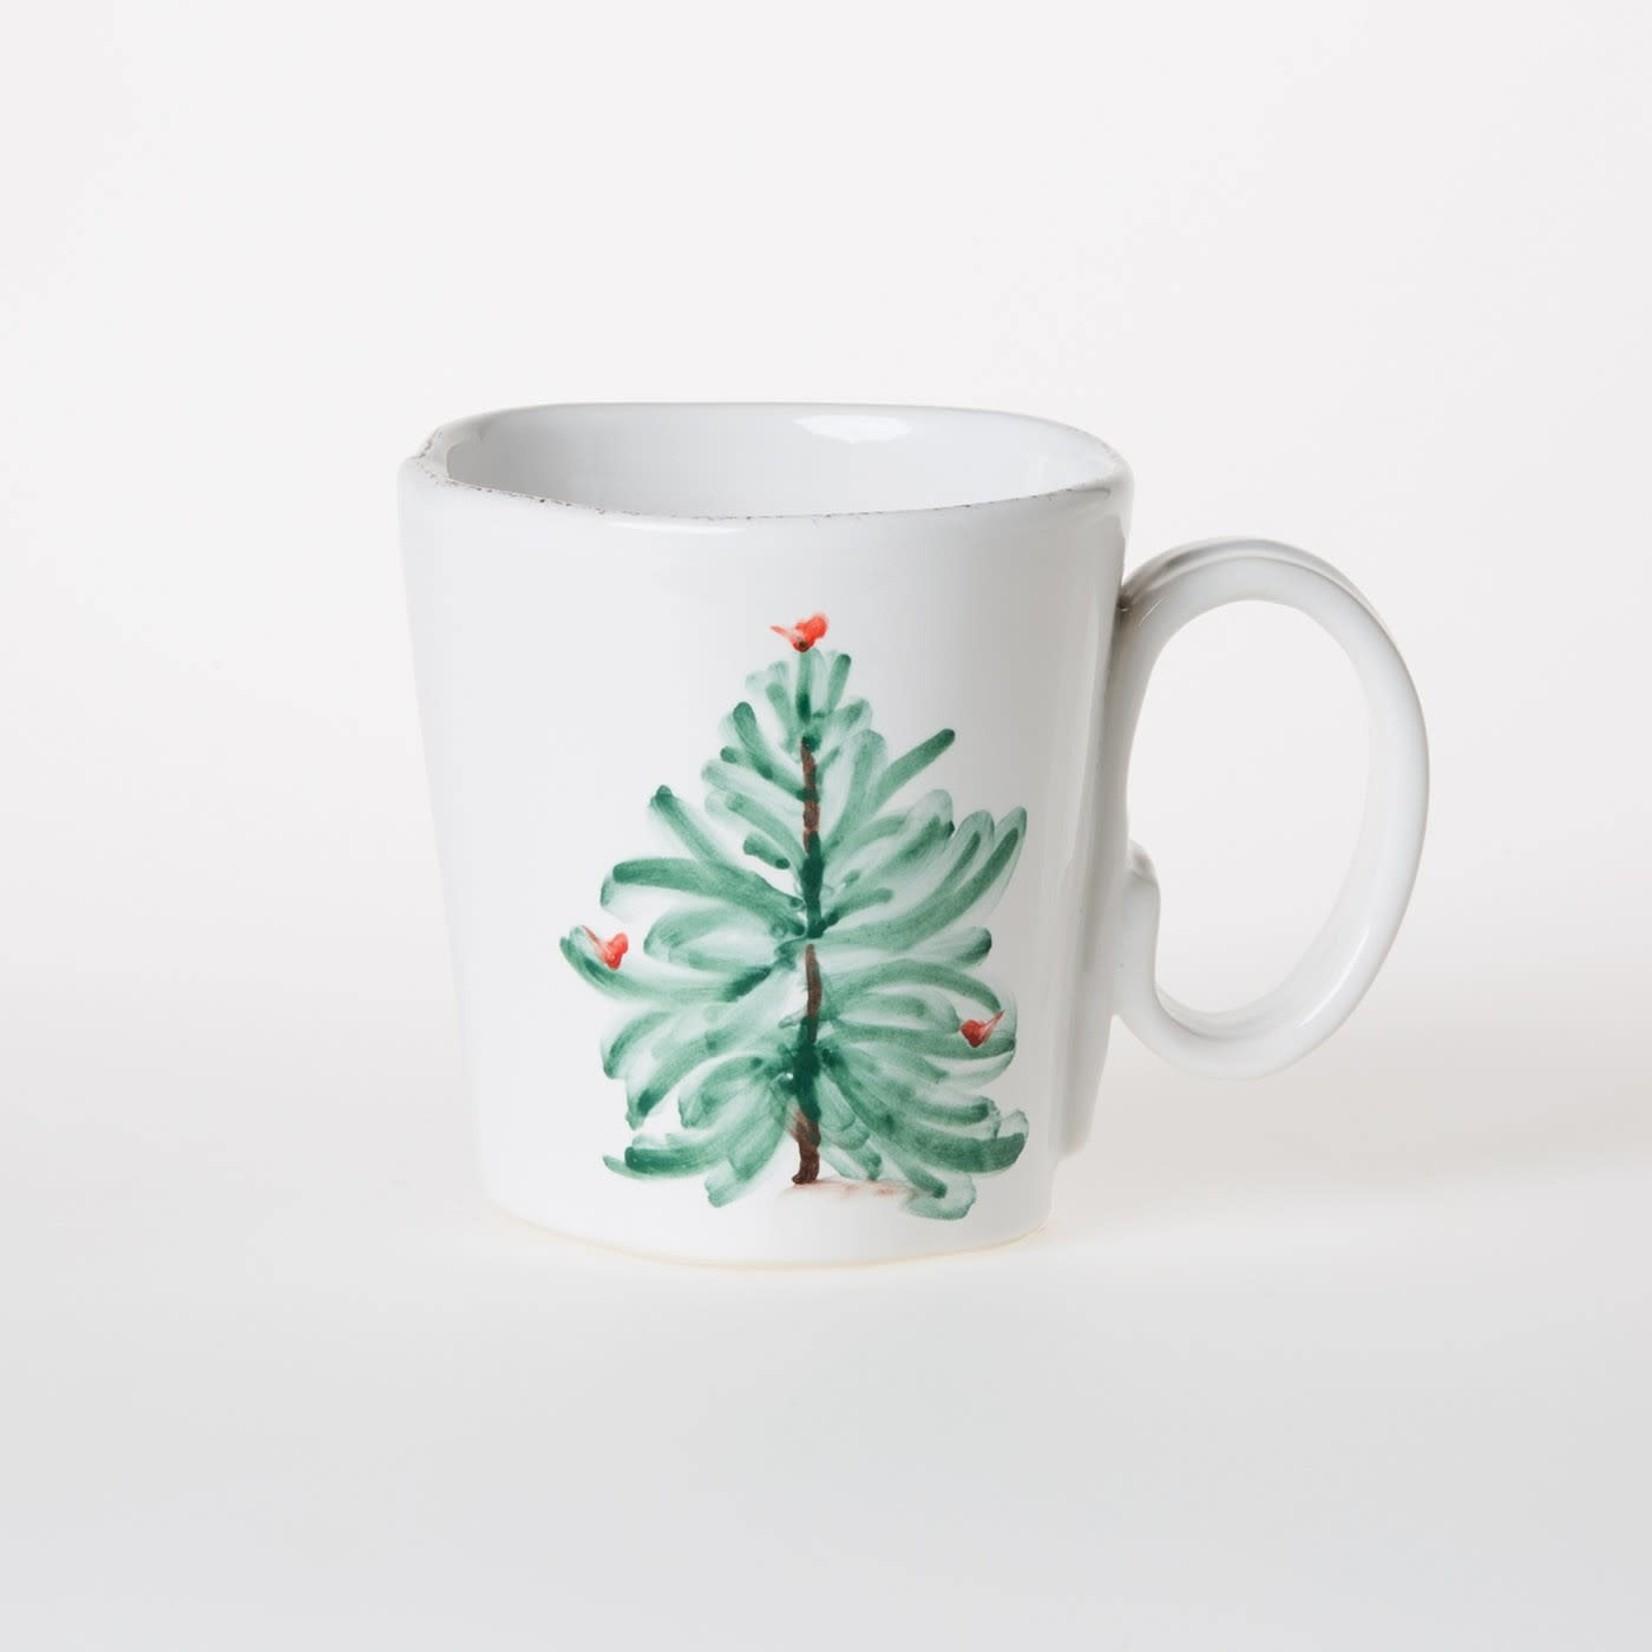 Lastra Holiday Mug